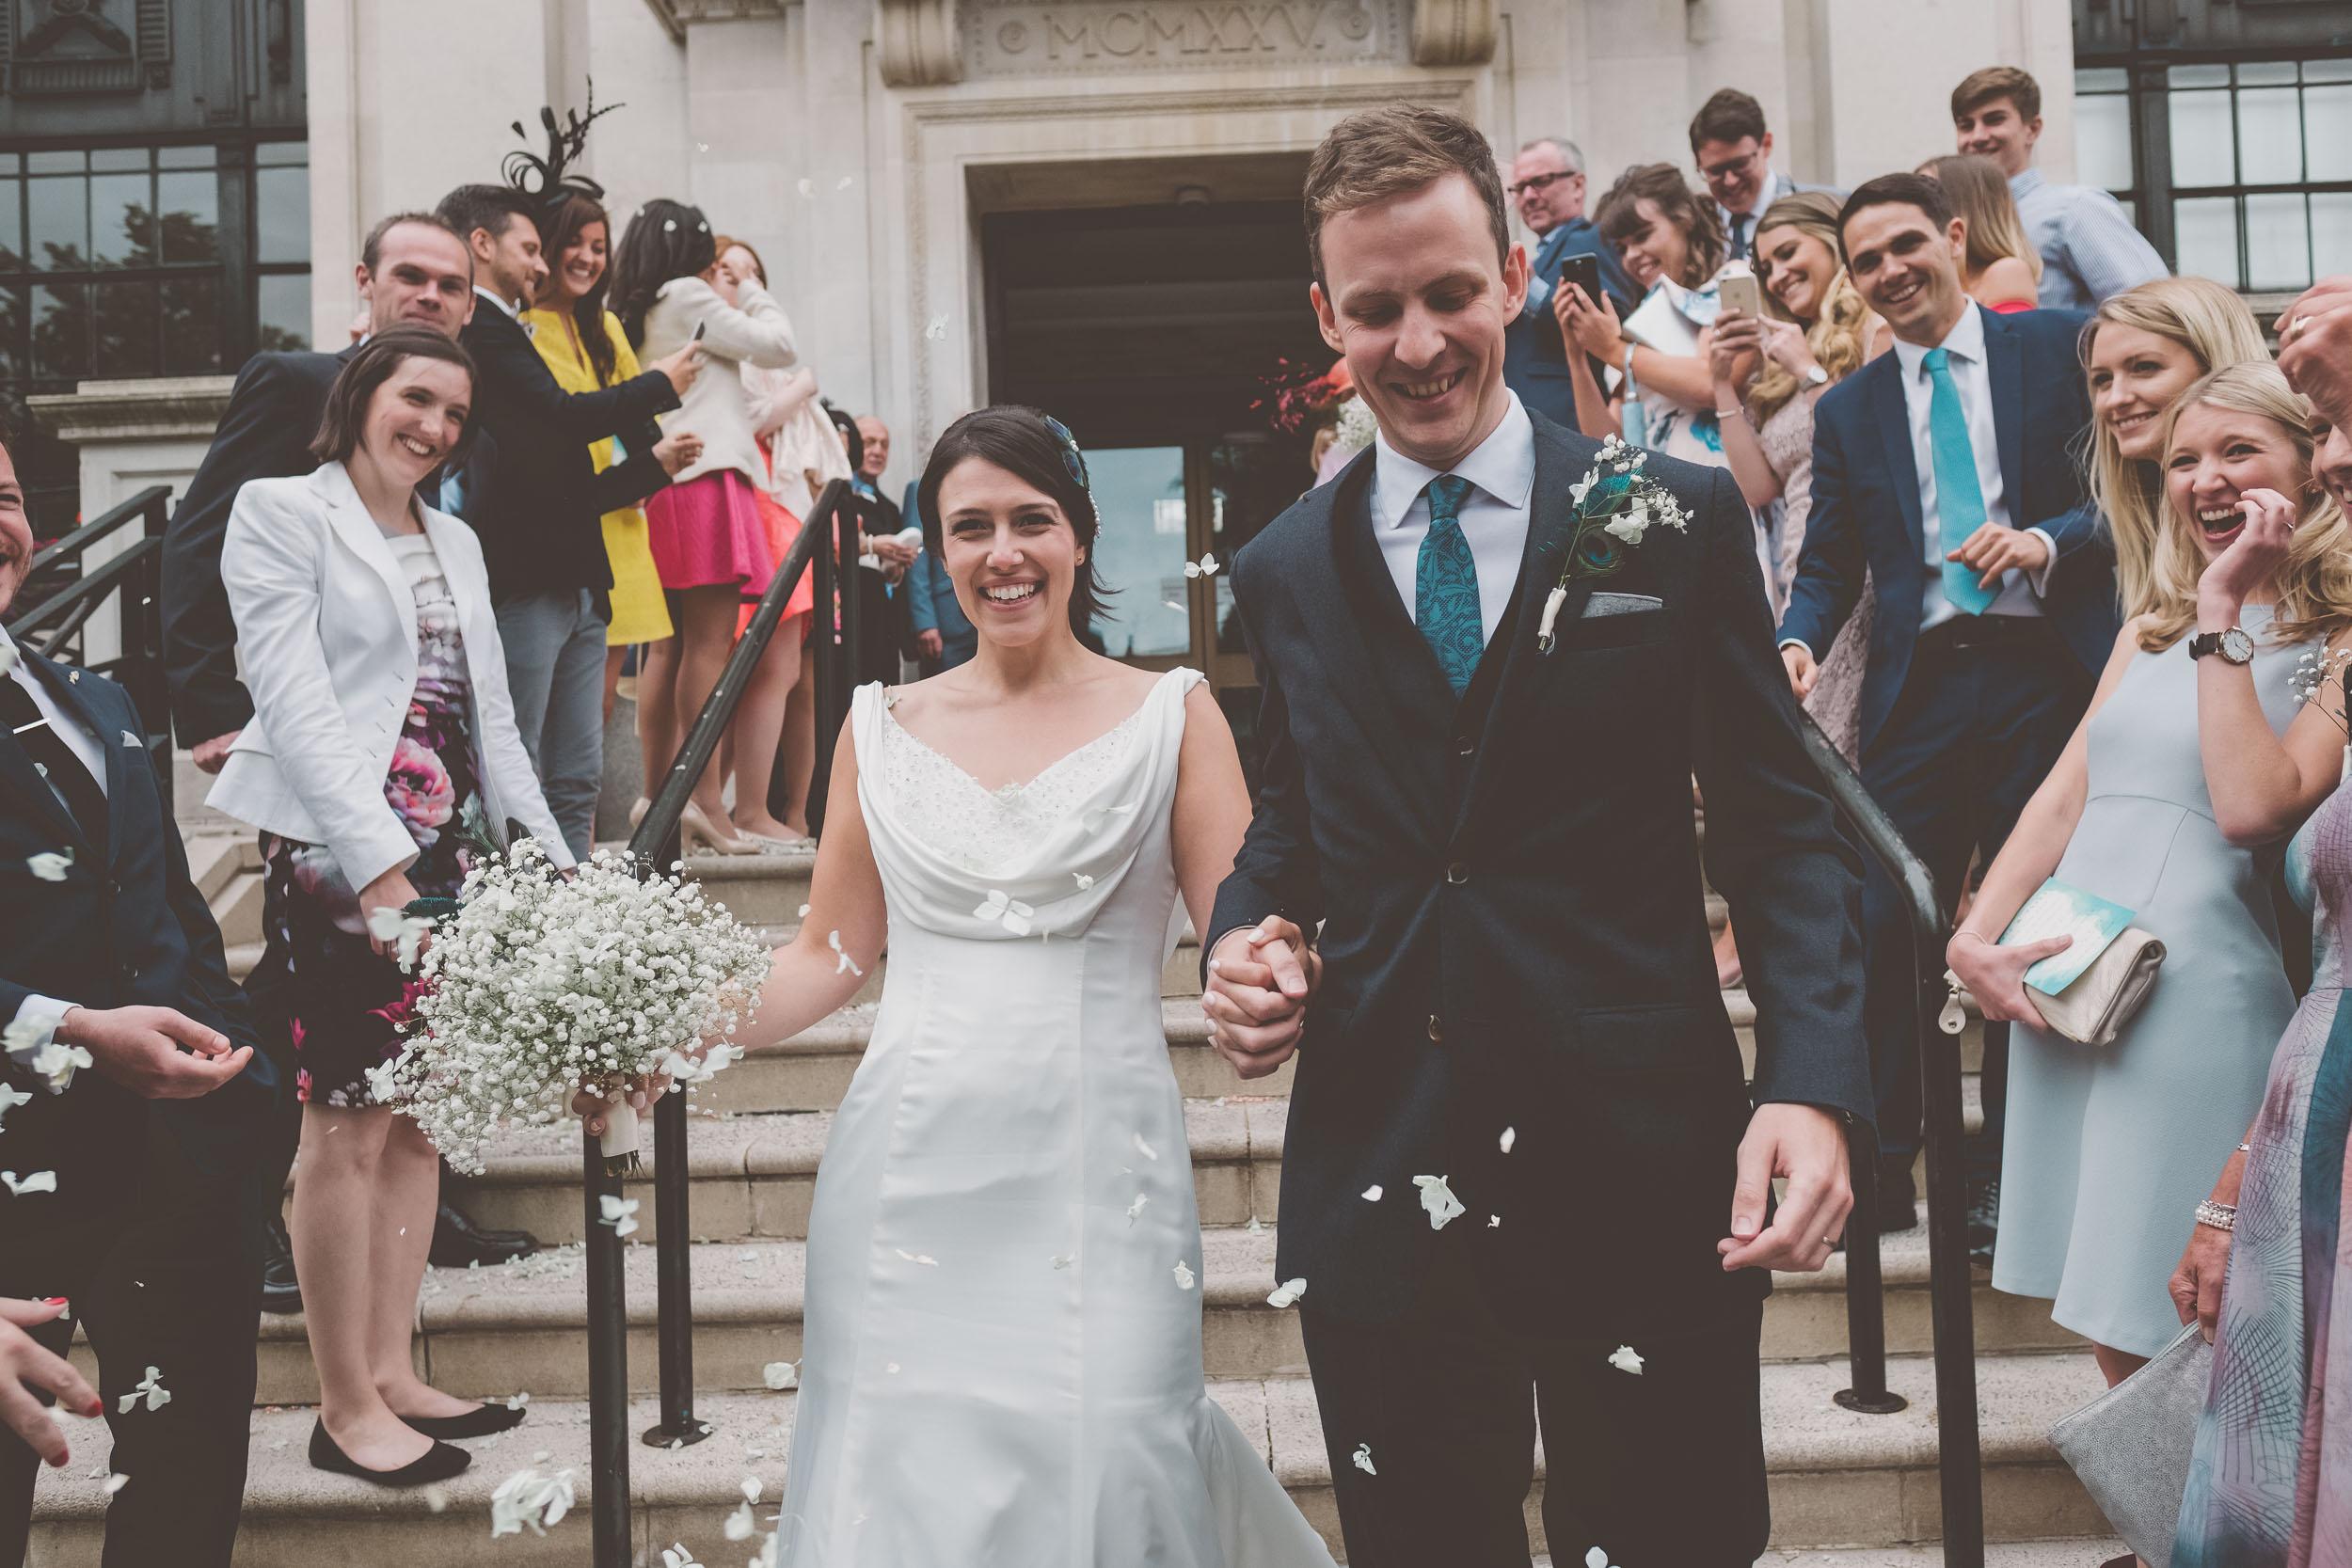 islington-town-hall-4th-floor-studios-wedding157.jpg